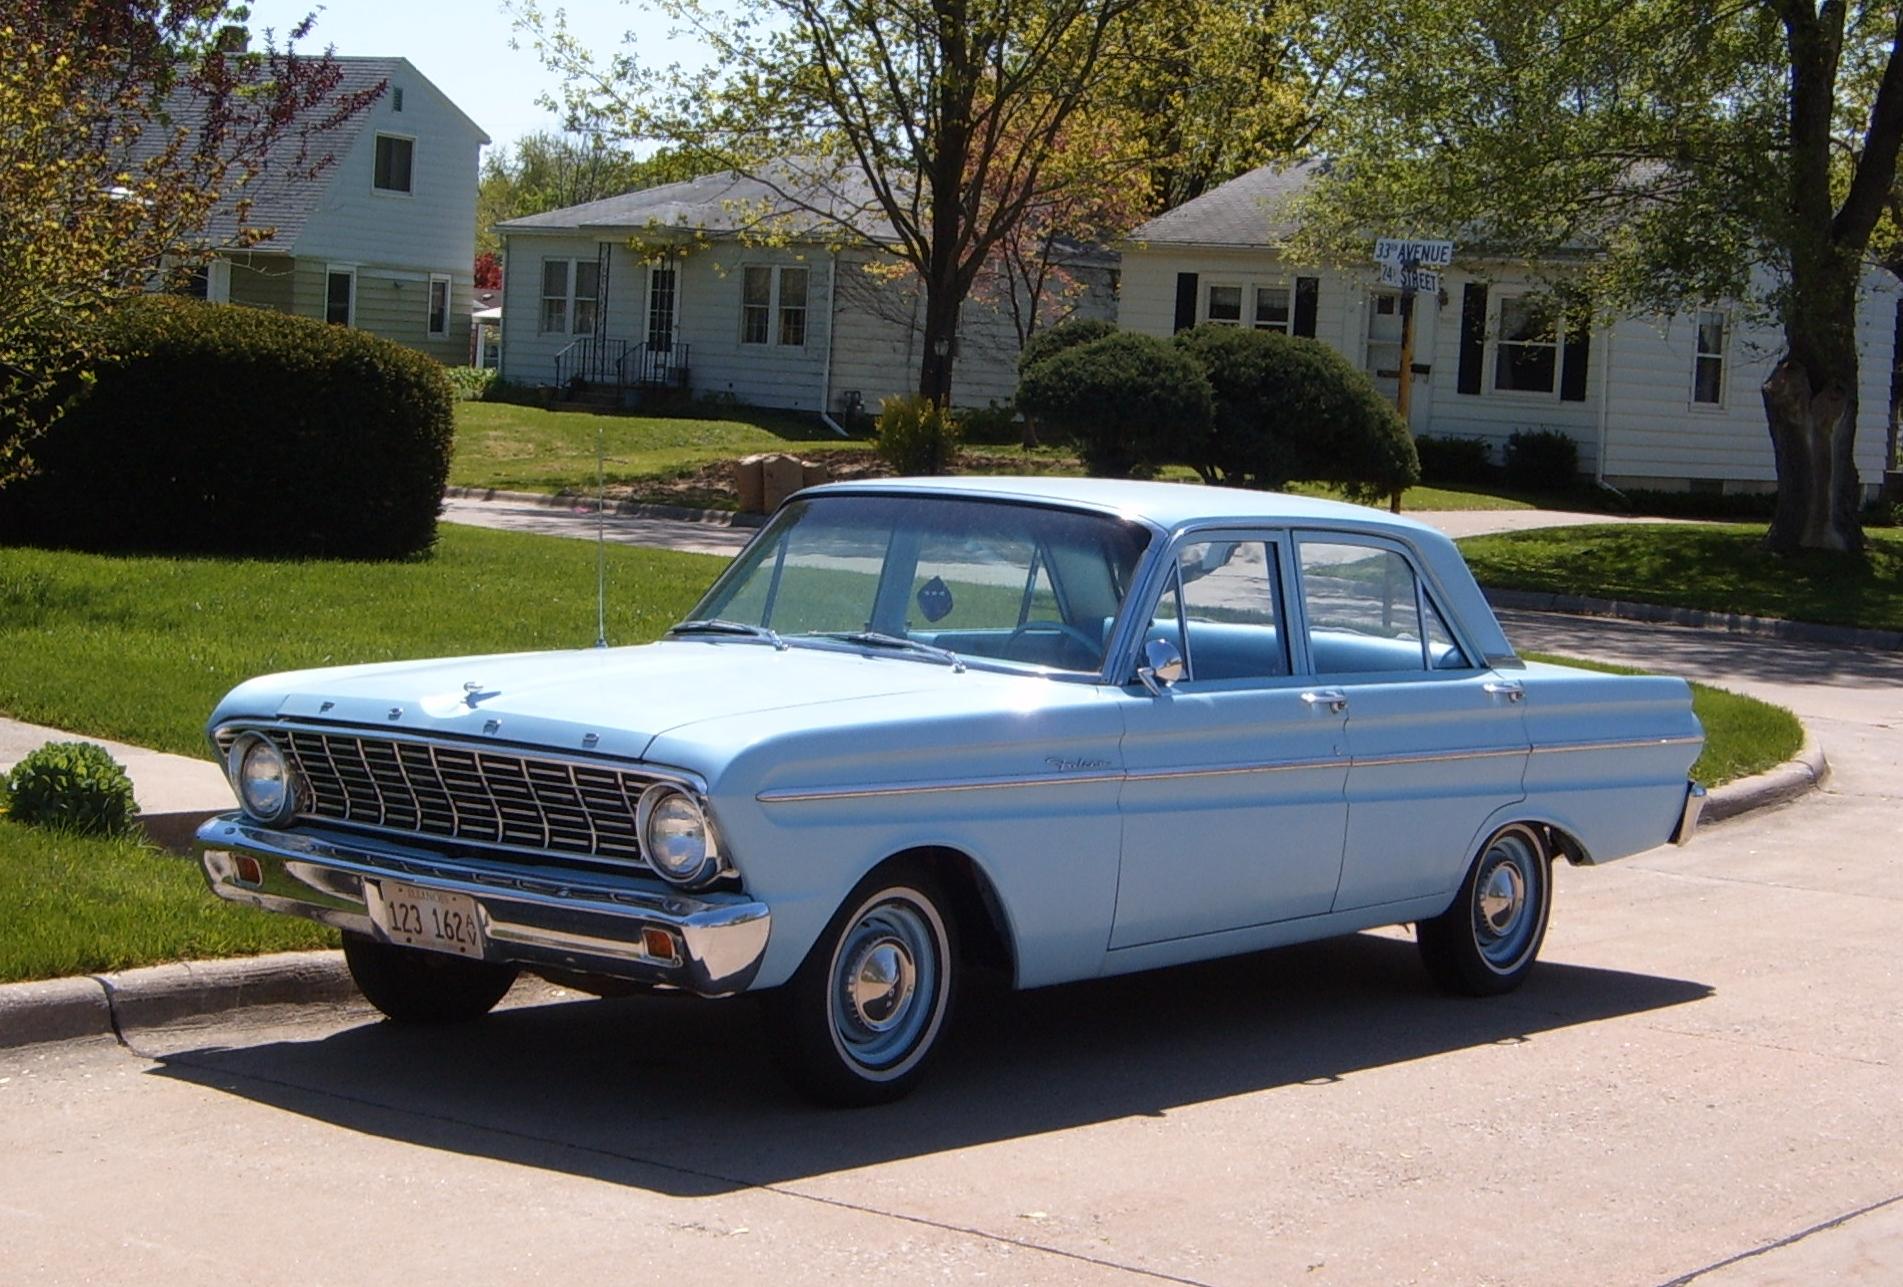 1964 ford falcon 4 door find used 1964 ford falcon 4 door 170 special - 1964 Ford Falcon 4 Door Find Used 1964 Ford Falcon 4 Door 170 Special 3